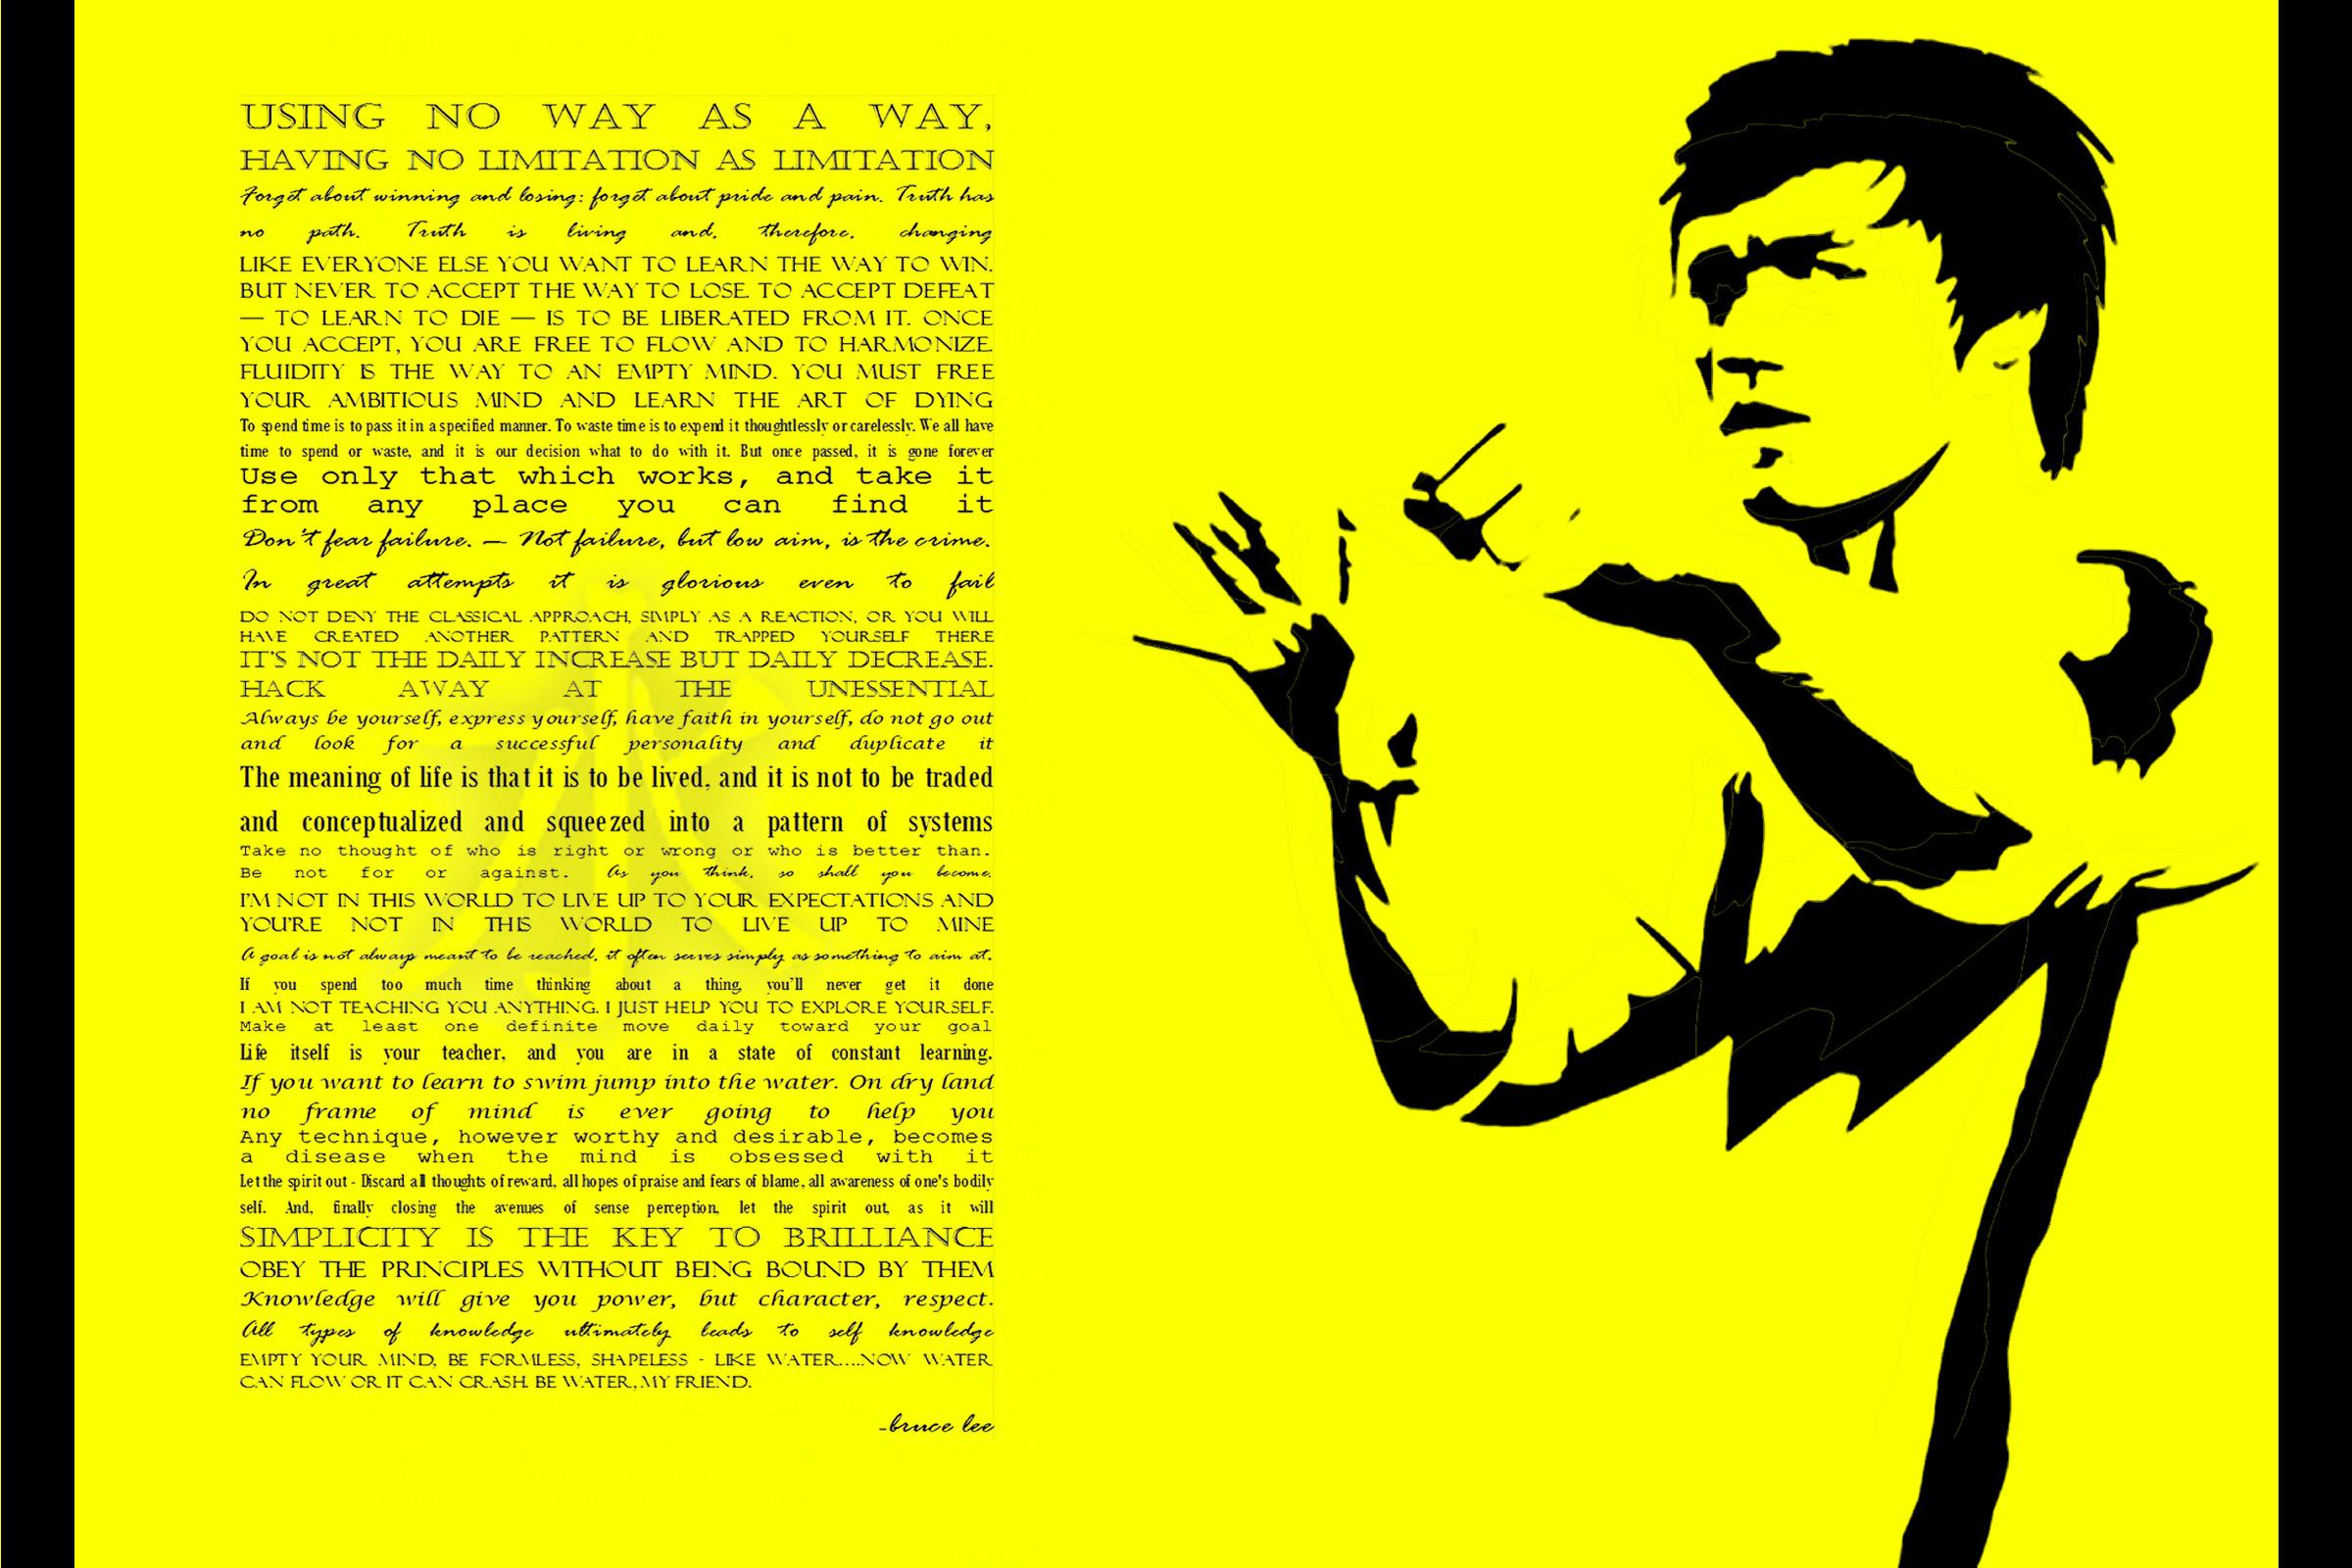 Free Download Kenpo Karate Wallpaper Martial Arts Wallpapers 2400x1600 For Your Desktop Mobile Tablet Explore 48 Kenpo Karate Wallpaper Kenpo Karate Wallpaper Karate Wallpapers Karate Wallpaper